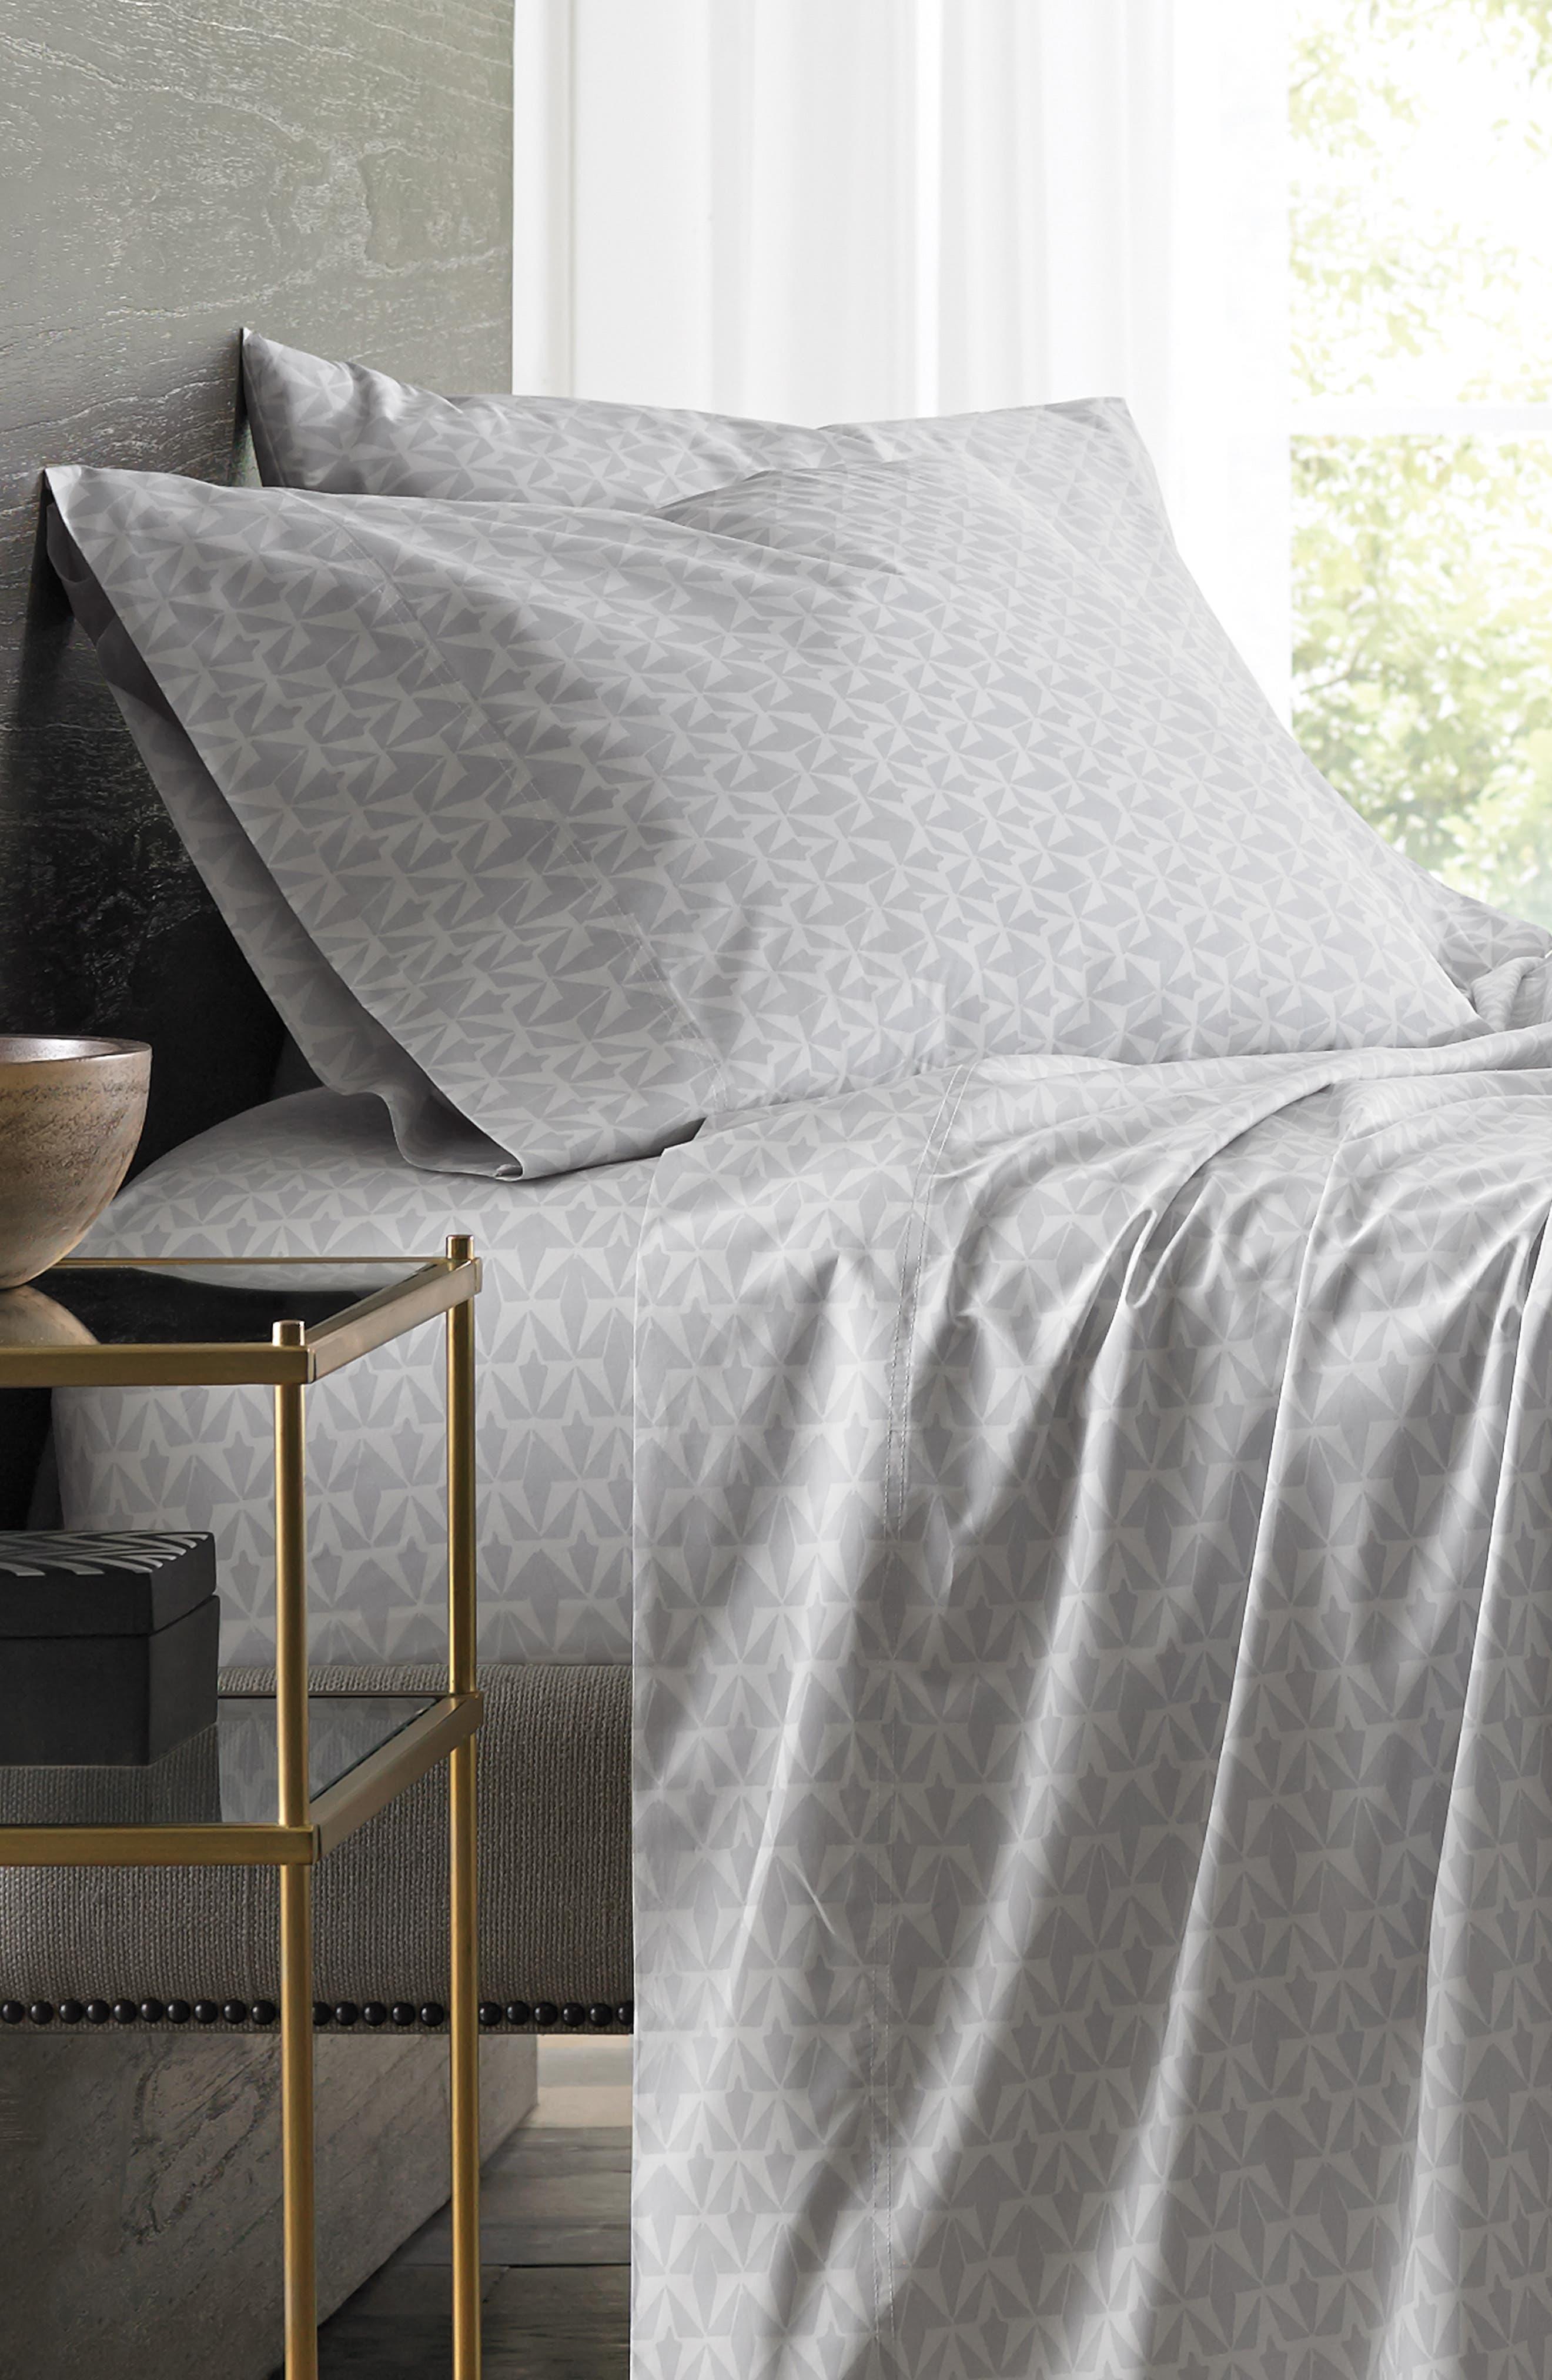 Grasslands 300 Thread Count Pair of Pillowcases,                             Alternate thumbnail 3, color,                             Nibus/ Light/ Pastel Grey